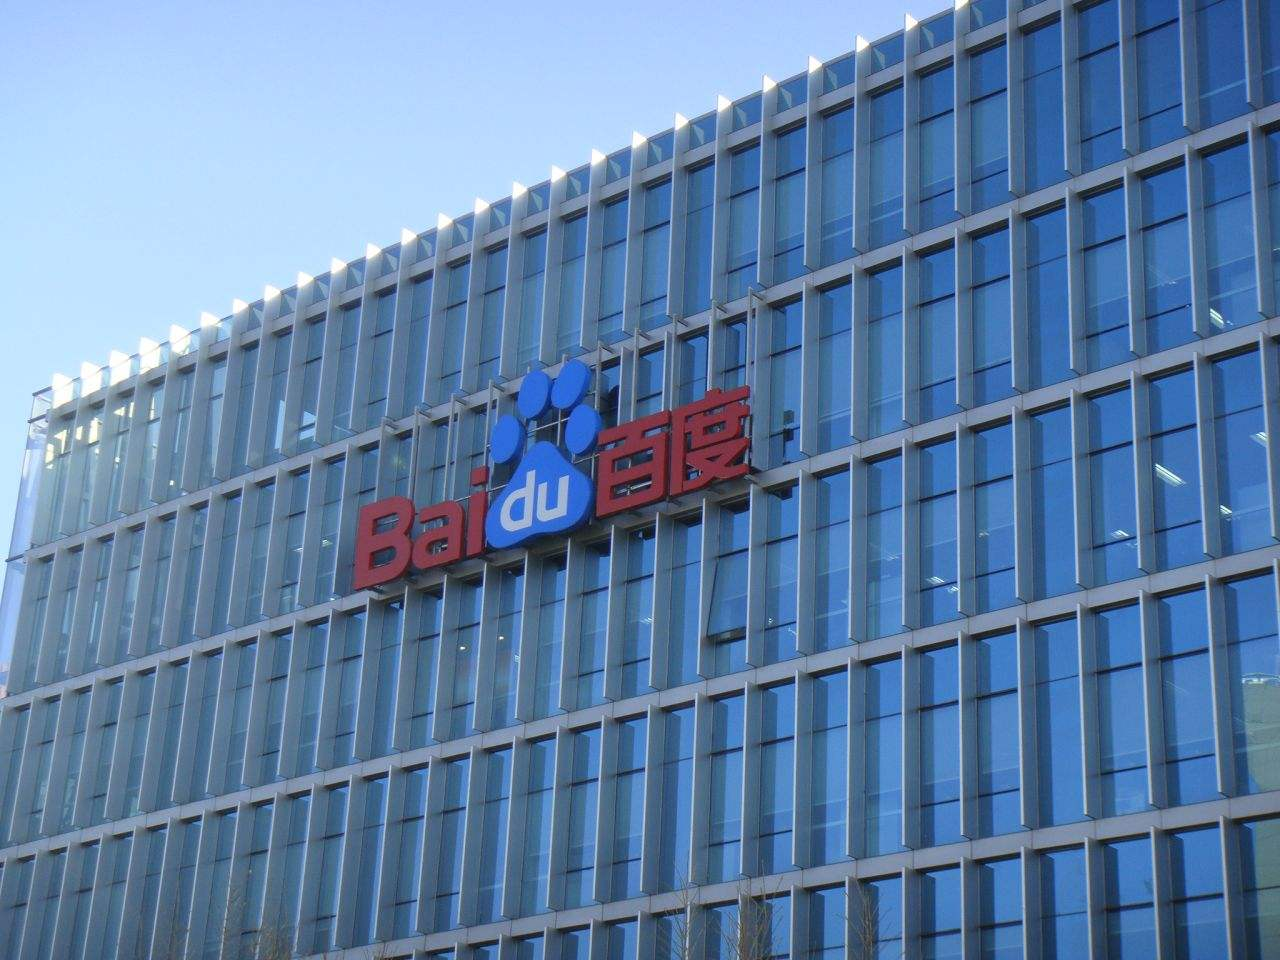 Image credit: Baidu